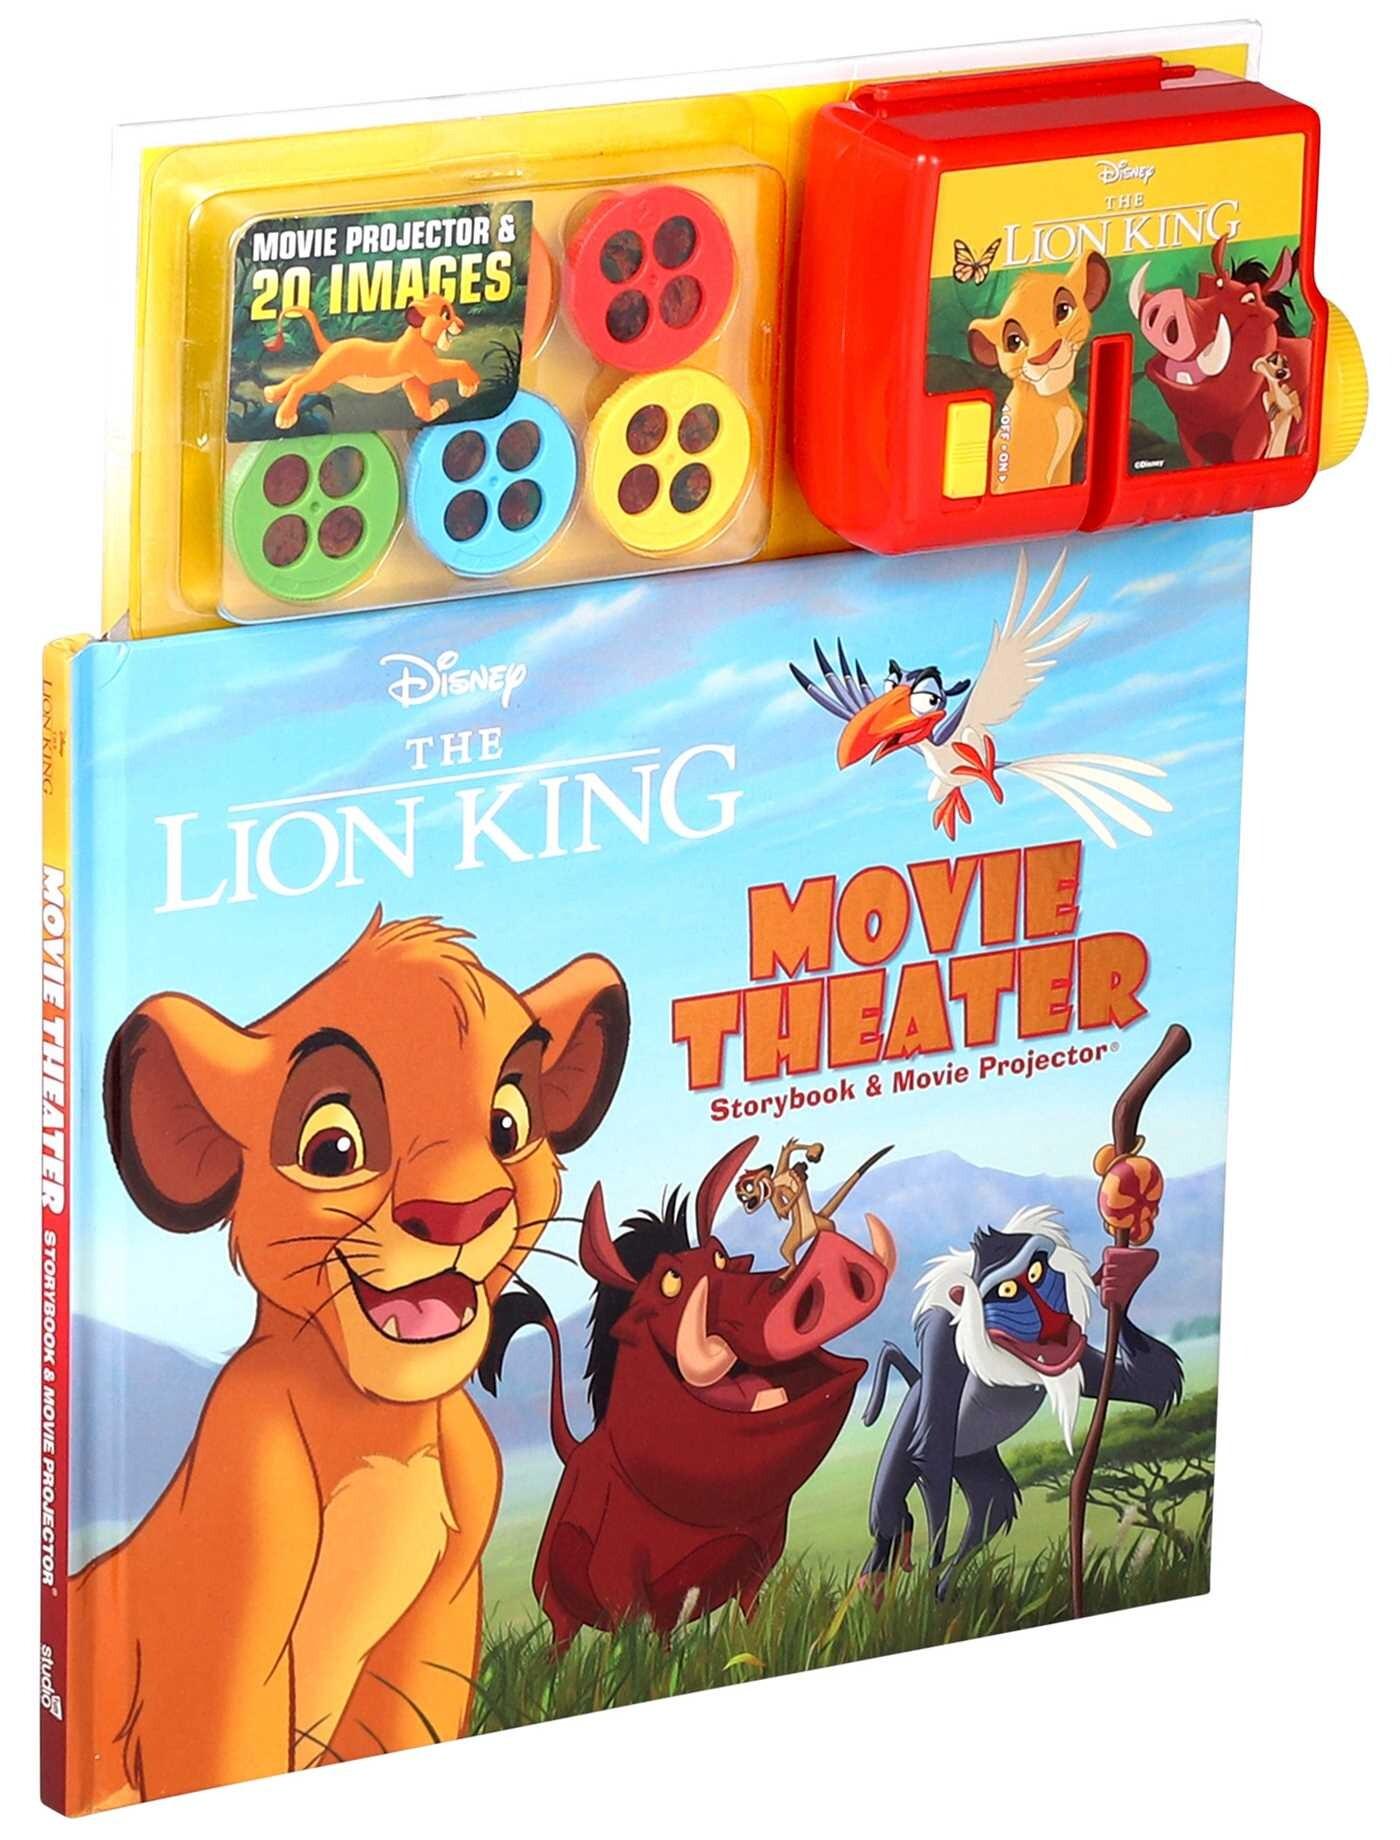 Disney The Lion King Movie Theater Storybook Amp Movie